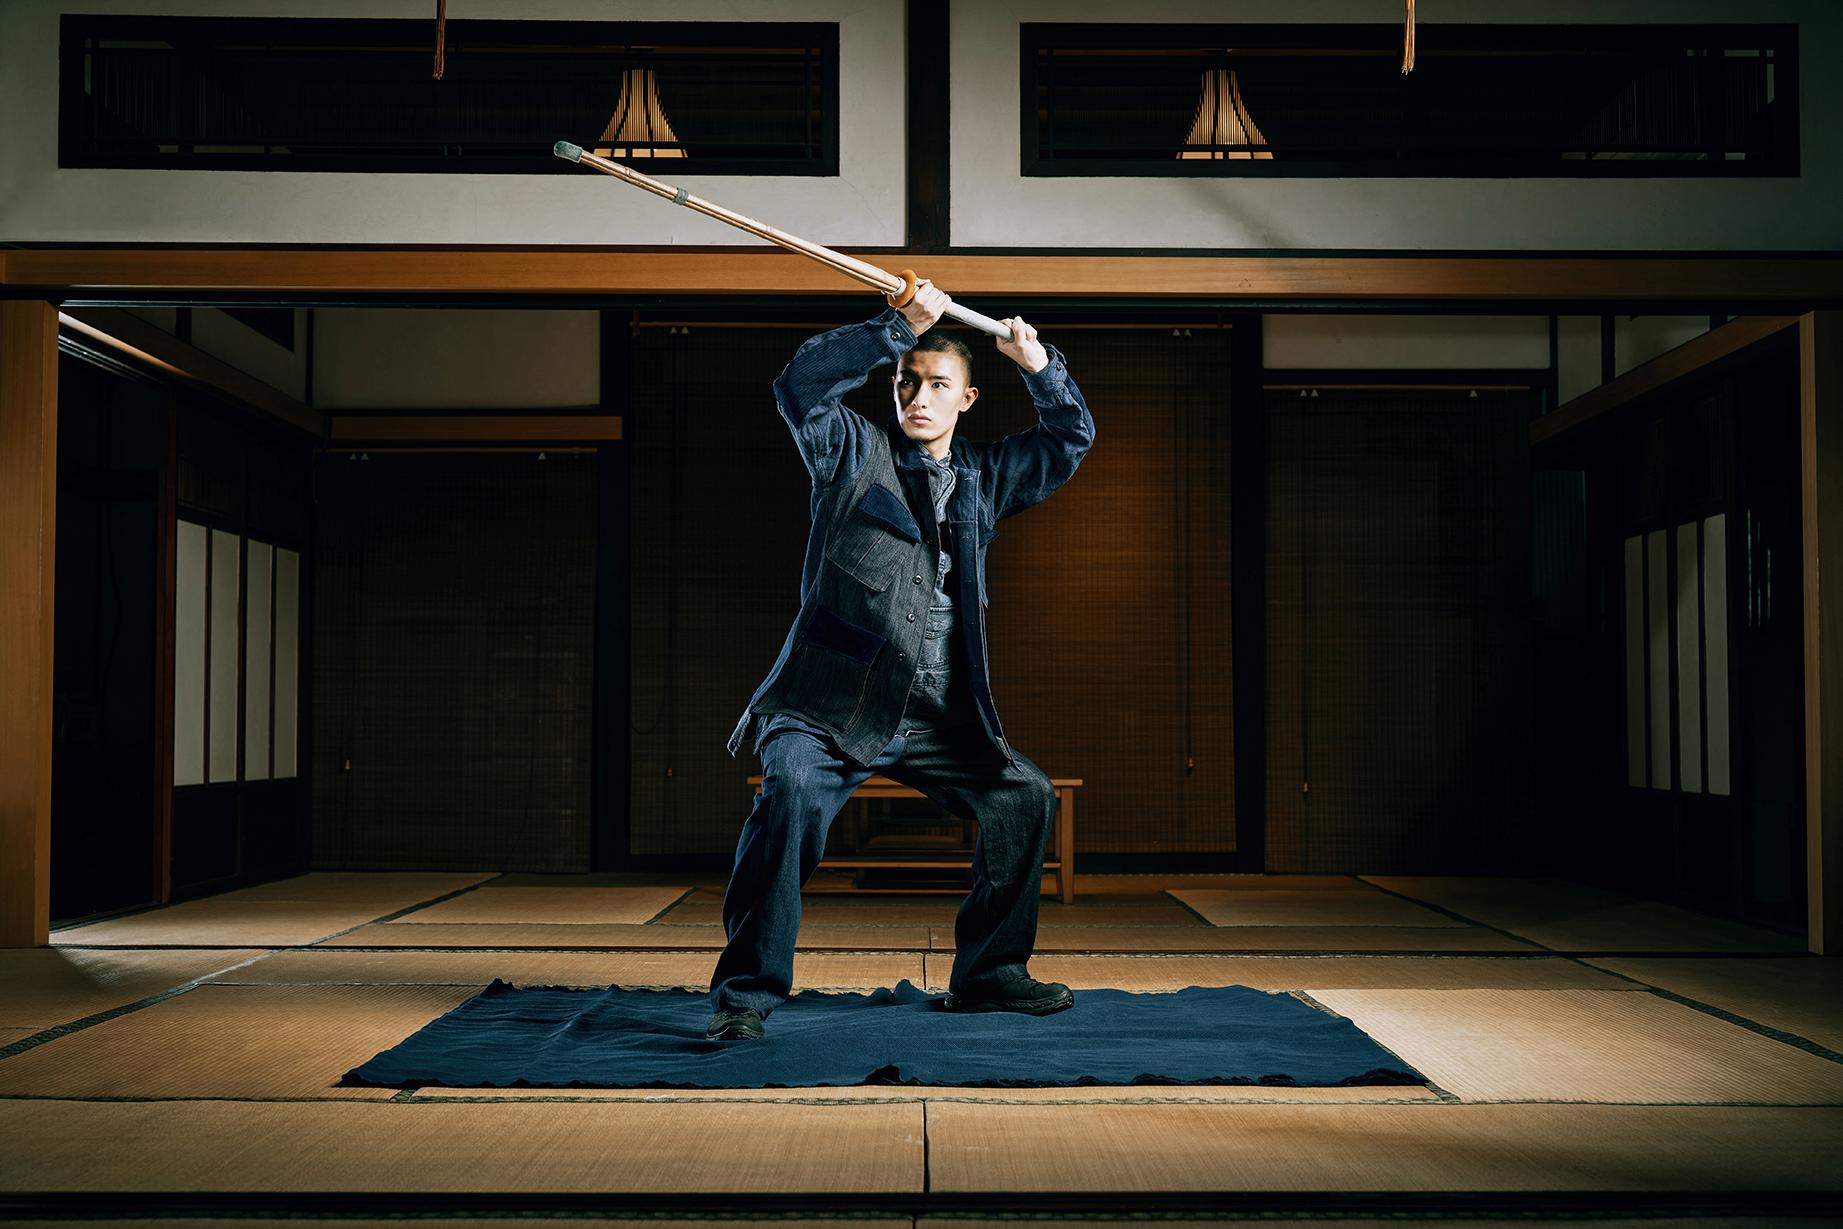 SYNDRO,刺子,SYNDRO刺子,劍道,腦說,刺子繡,拼接,丹寧,軍裝